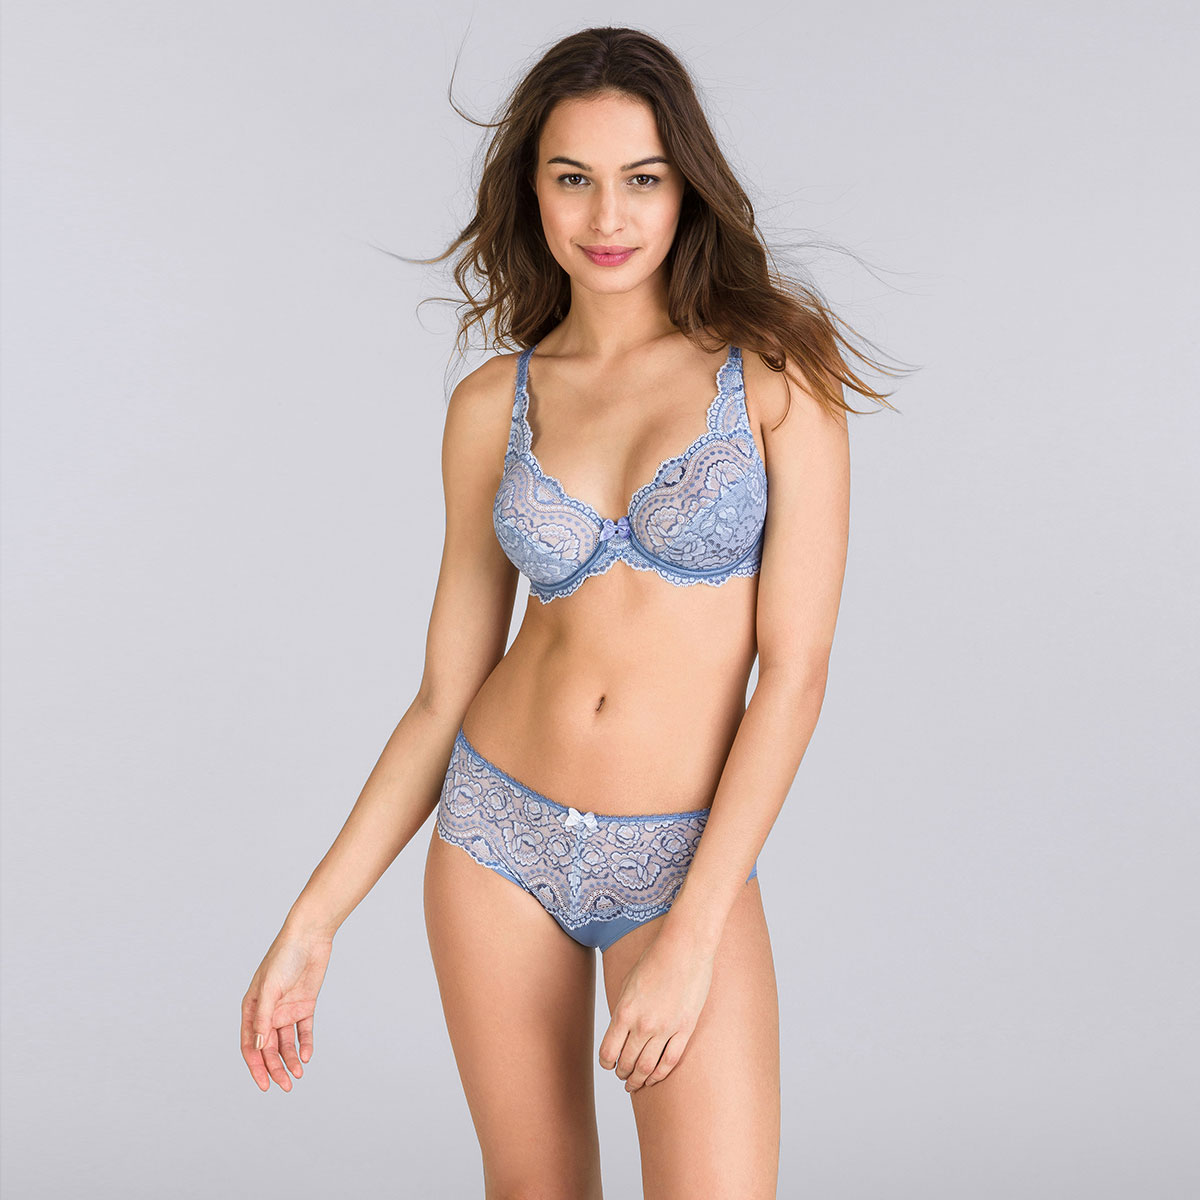 Soutien-gorge emboîtant bleu jean bicolore - Flower Elegance-PLAYTEX